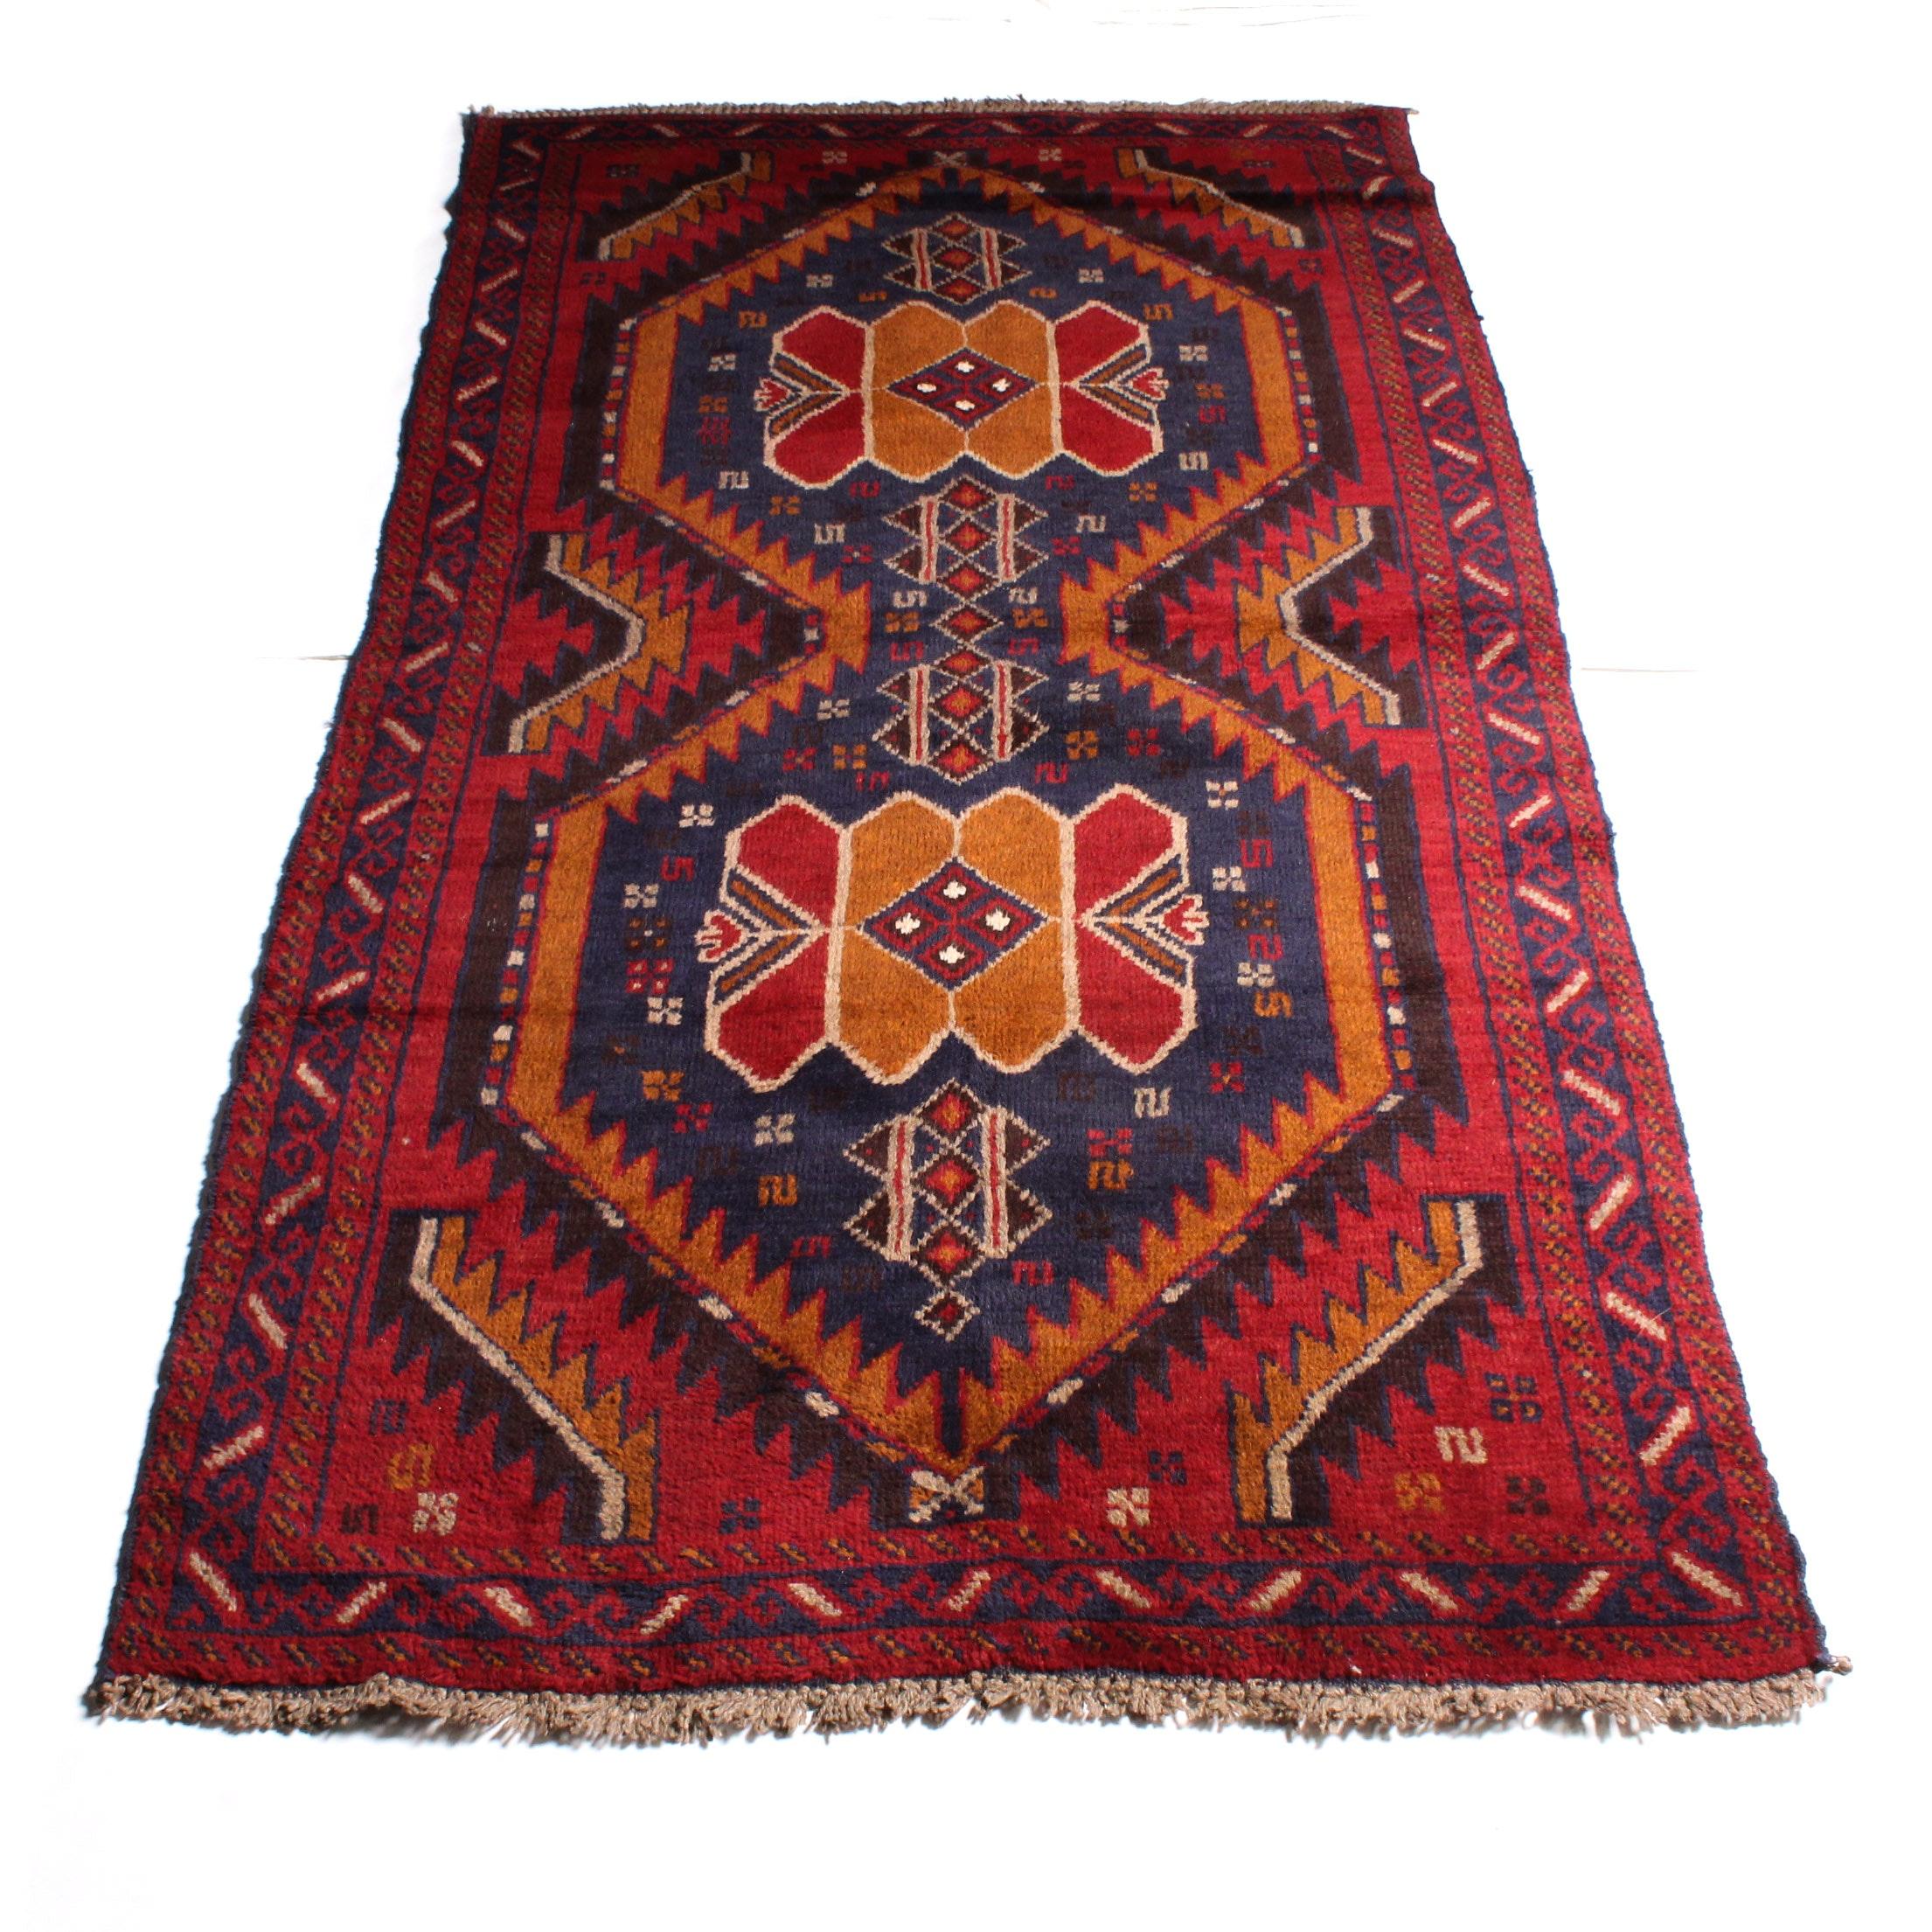 3'5 x 6'7 Hand-Knotted Afghan Kazak Rug